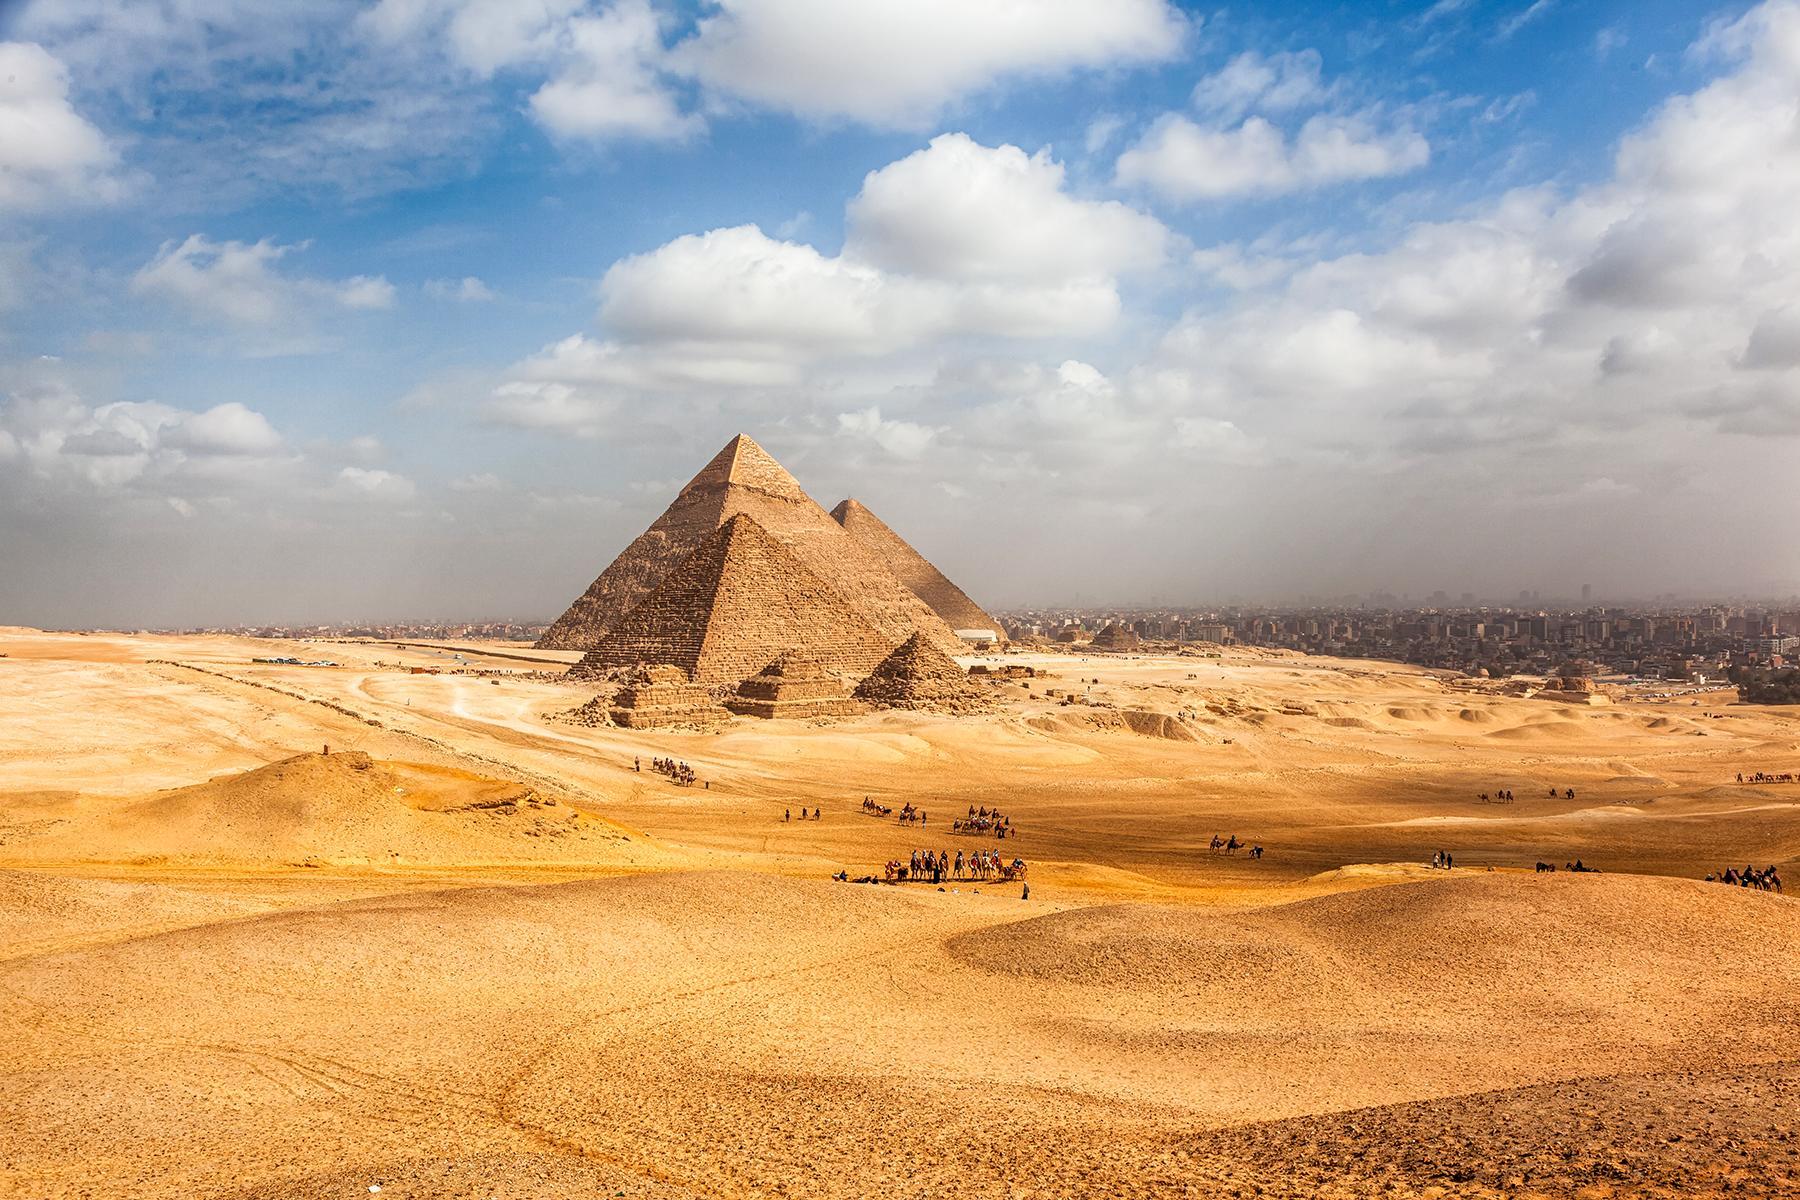 03_AdevnturousBabymoons__PyramidsofCairoEgypt_shutterstock_1178981587